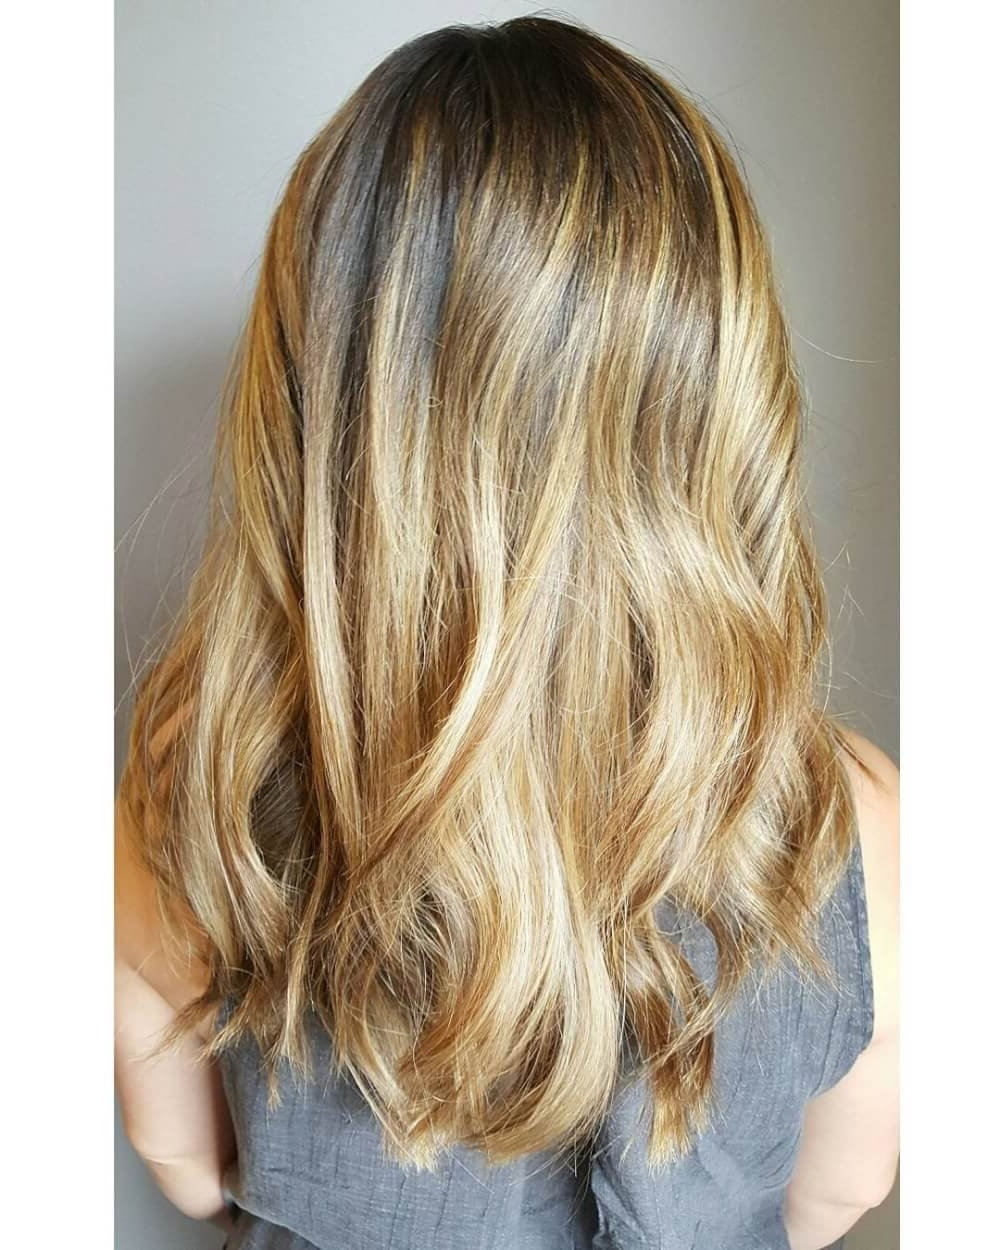 Famous Dark Blonde Hairstyles With Icy Streaks Regarding 38 Top Blonde Highlights Of 2018 – Platinum, Ash, Dirty, Honey & Dark (View 7 of 20)